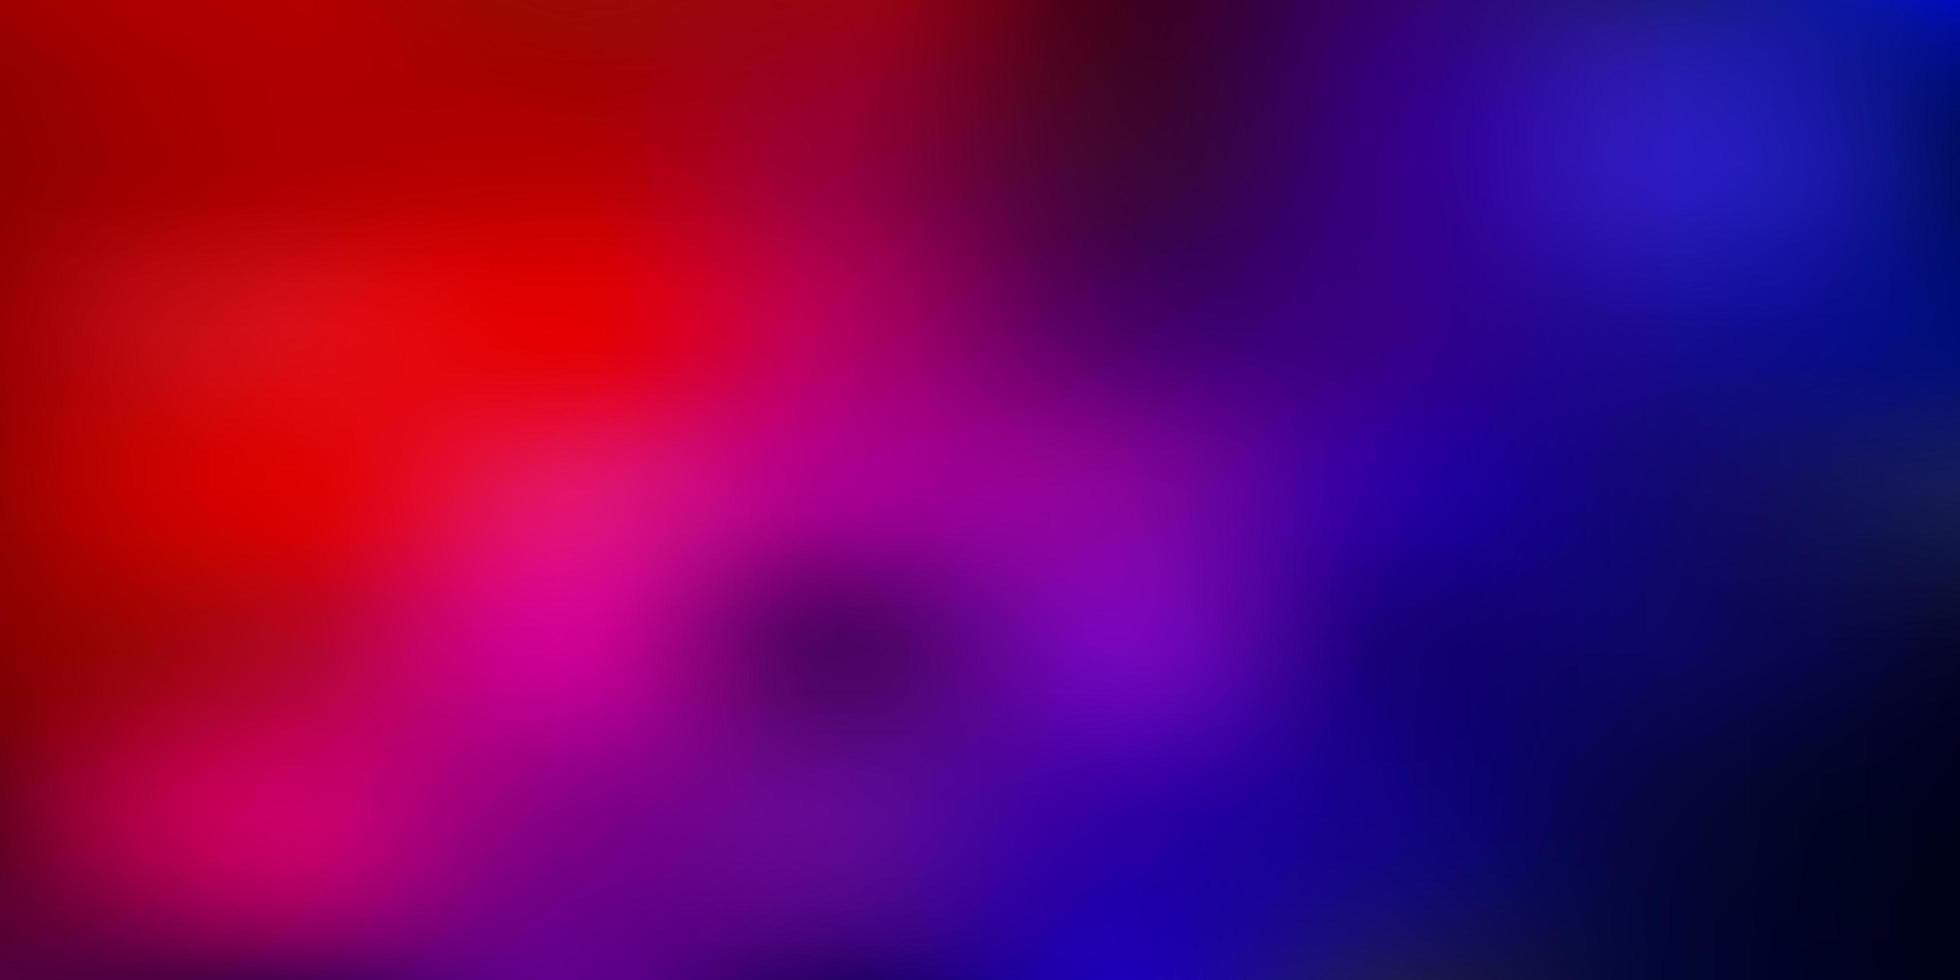 Light blue, red vector blurred backdrop